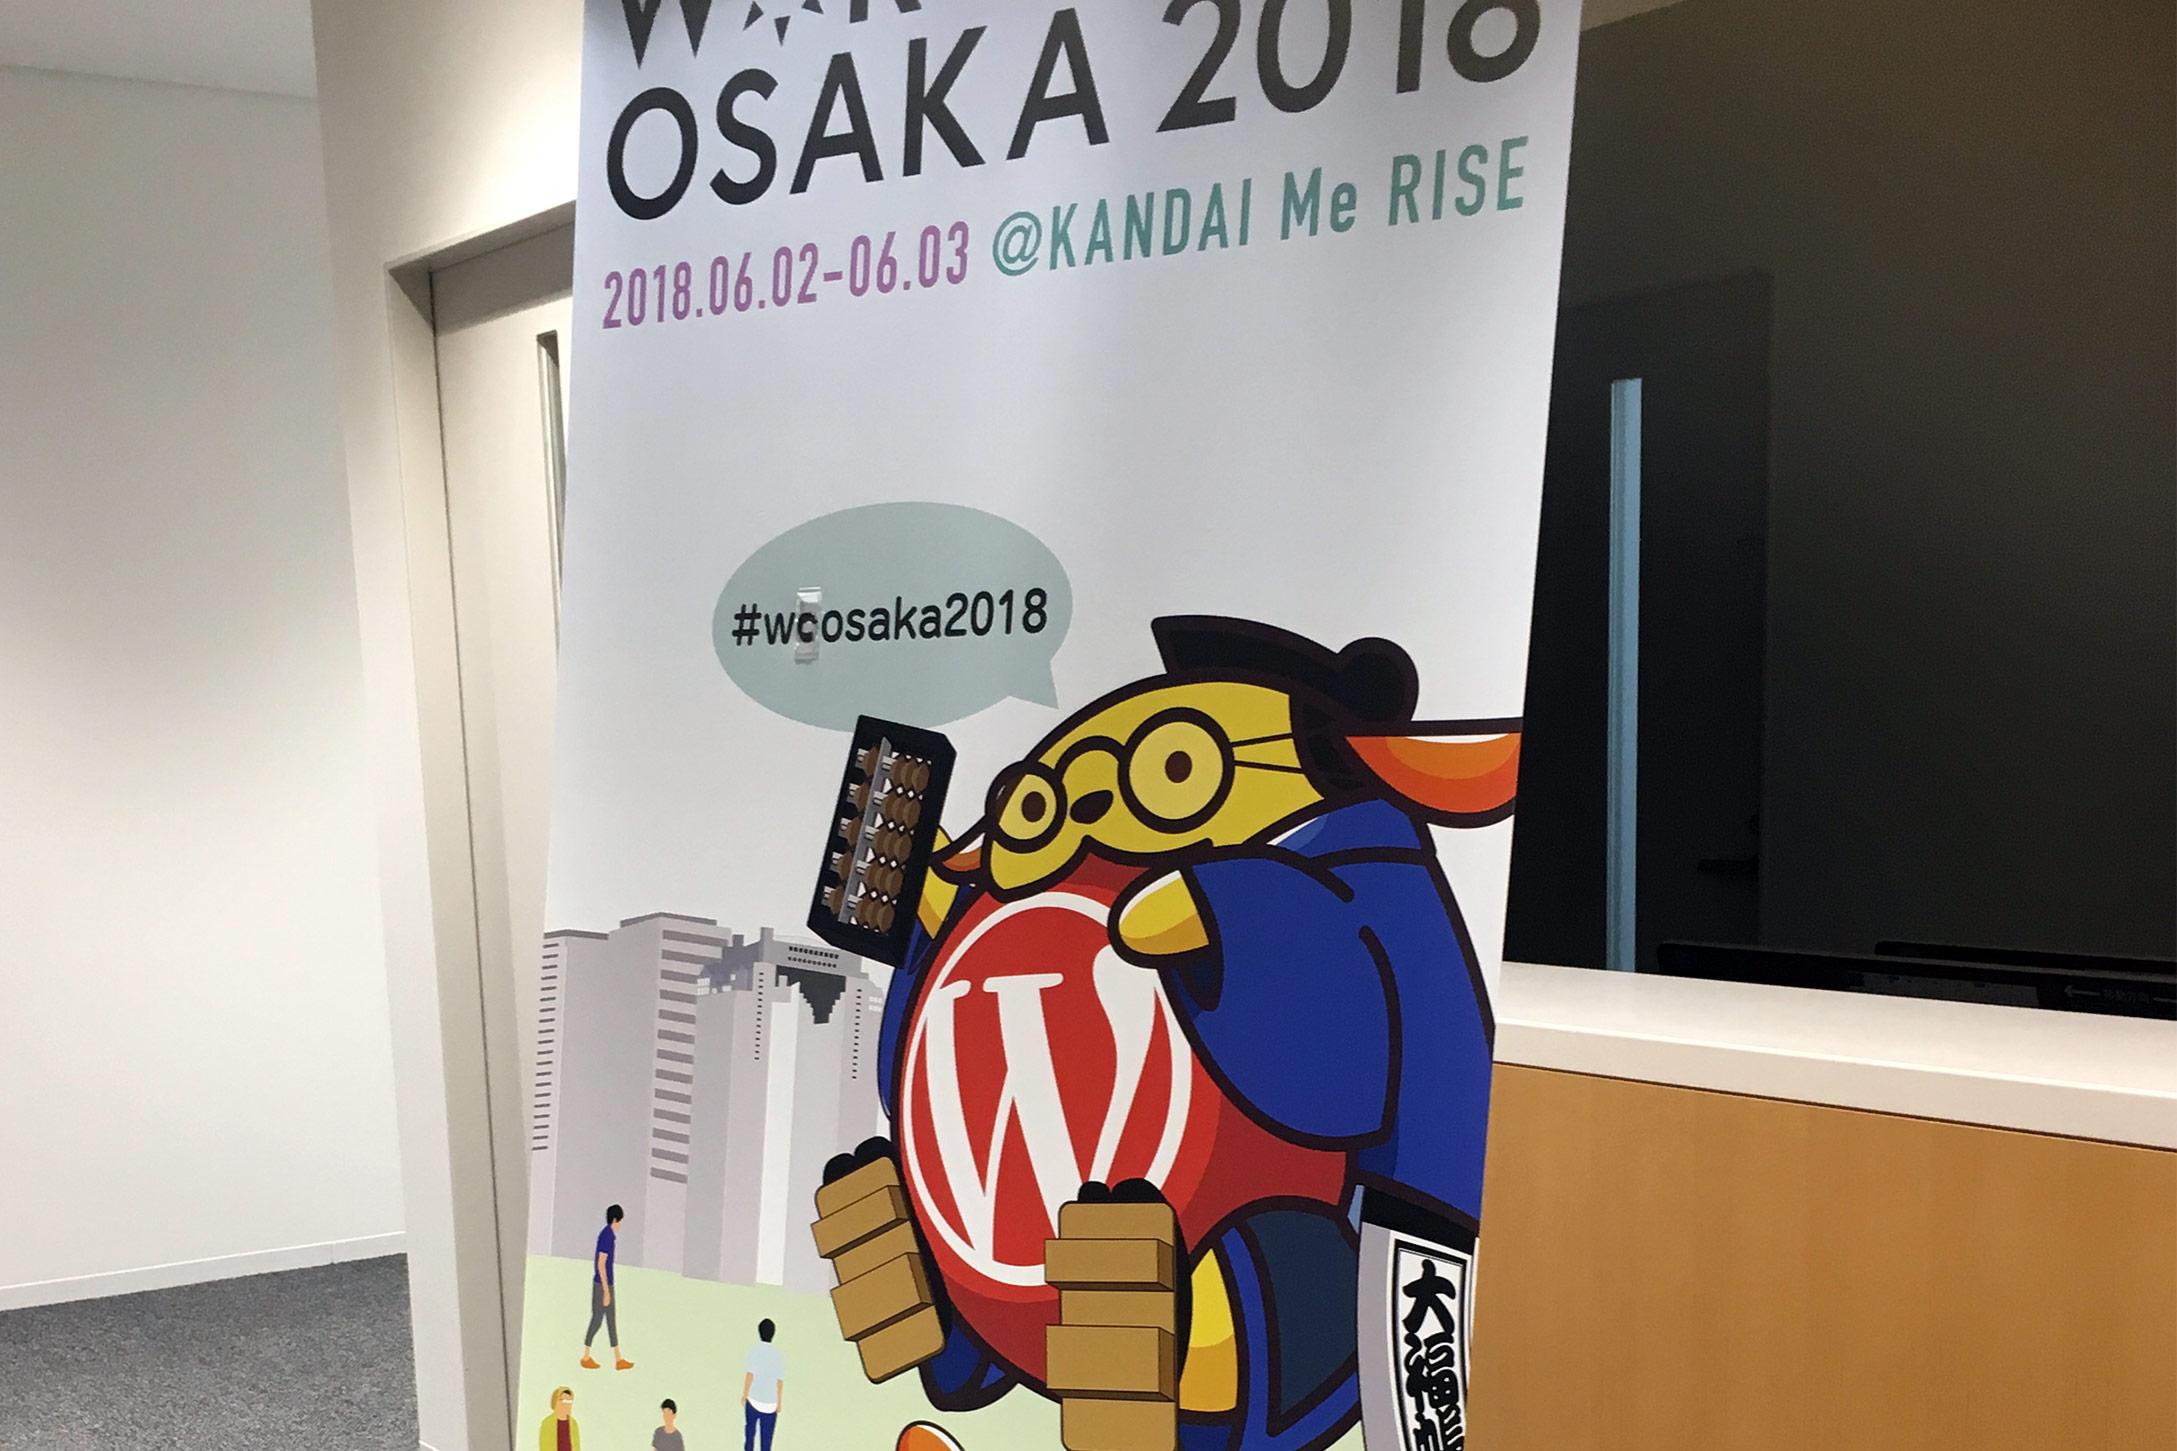 WordCamp Osaka 2018に実行委員として参加しました!